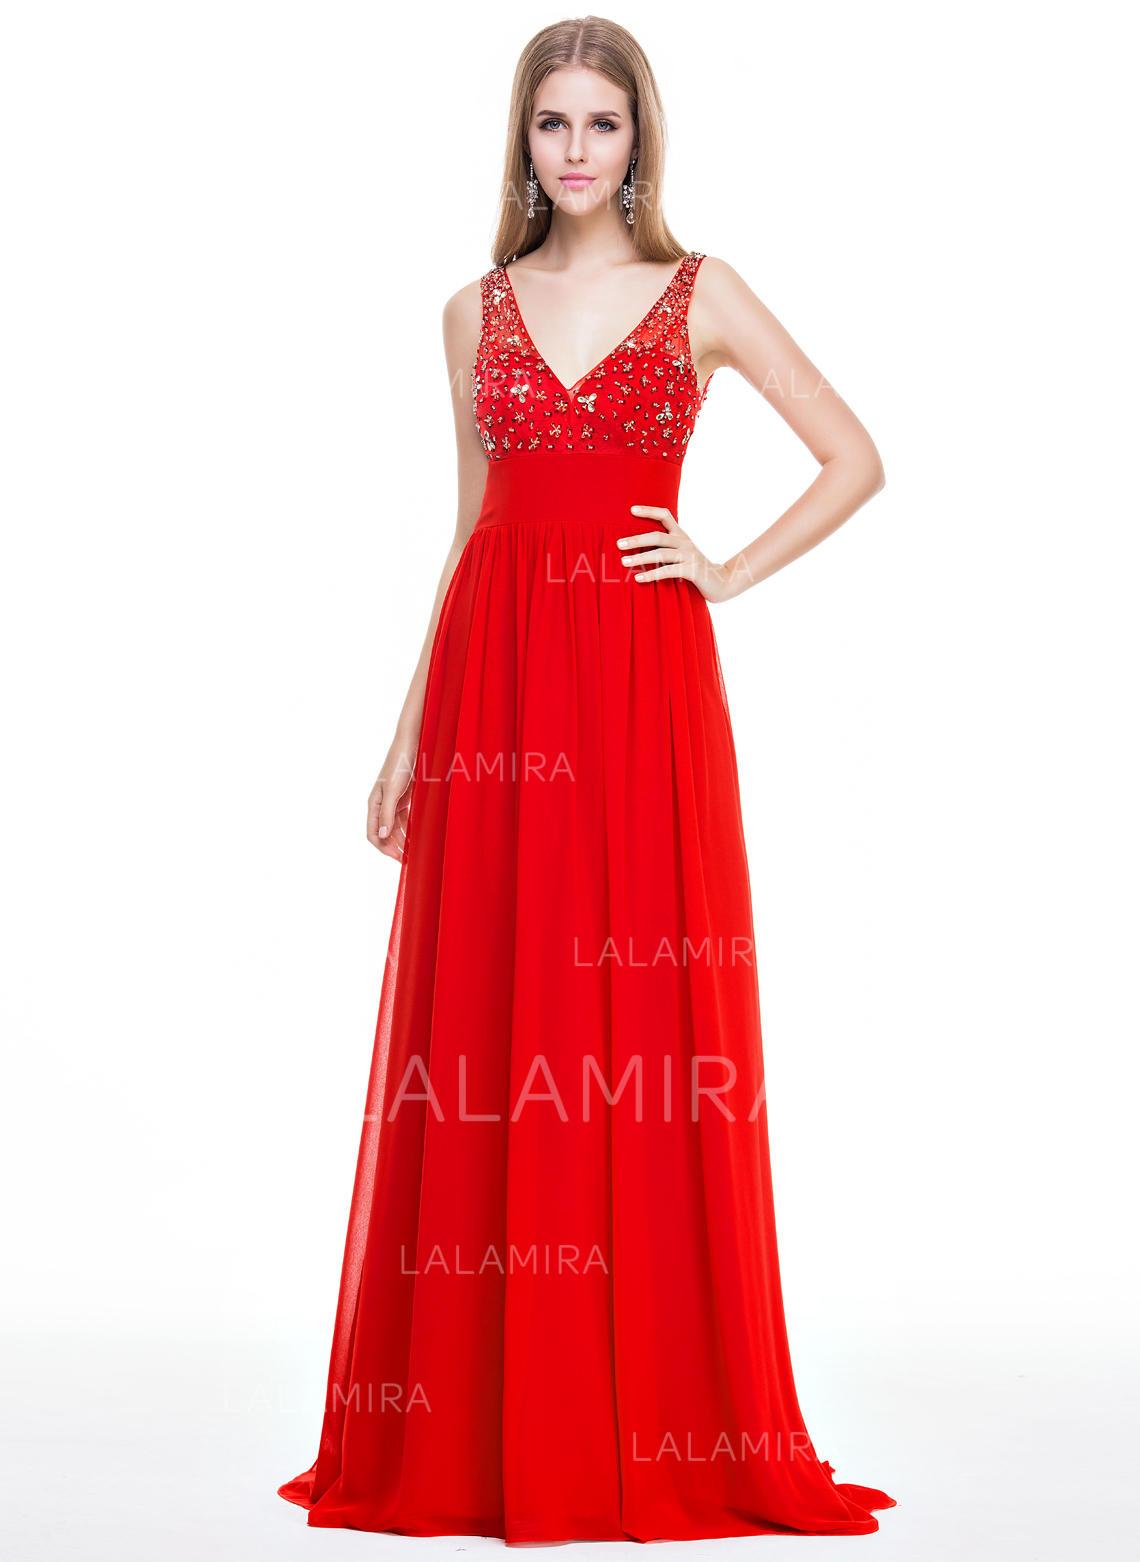 06cdd1e97a107 Empire Chiffon Prom Dresses Beading Sequins V-neck Sleeveless Sweep Train  (018058779). Loading zoom